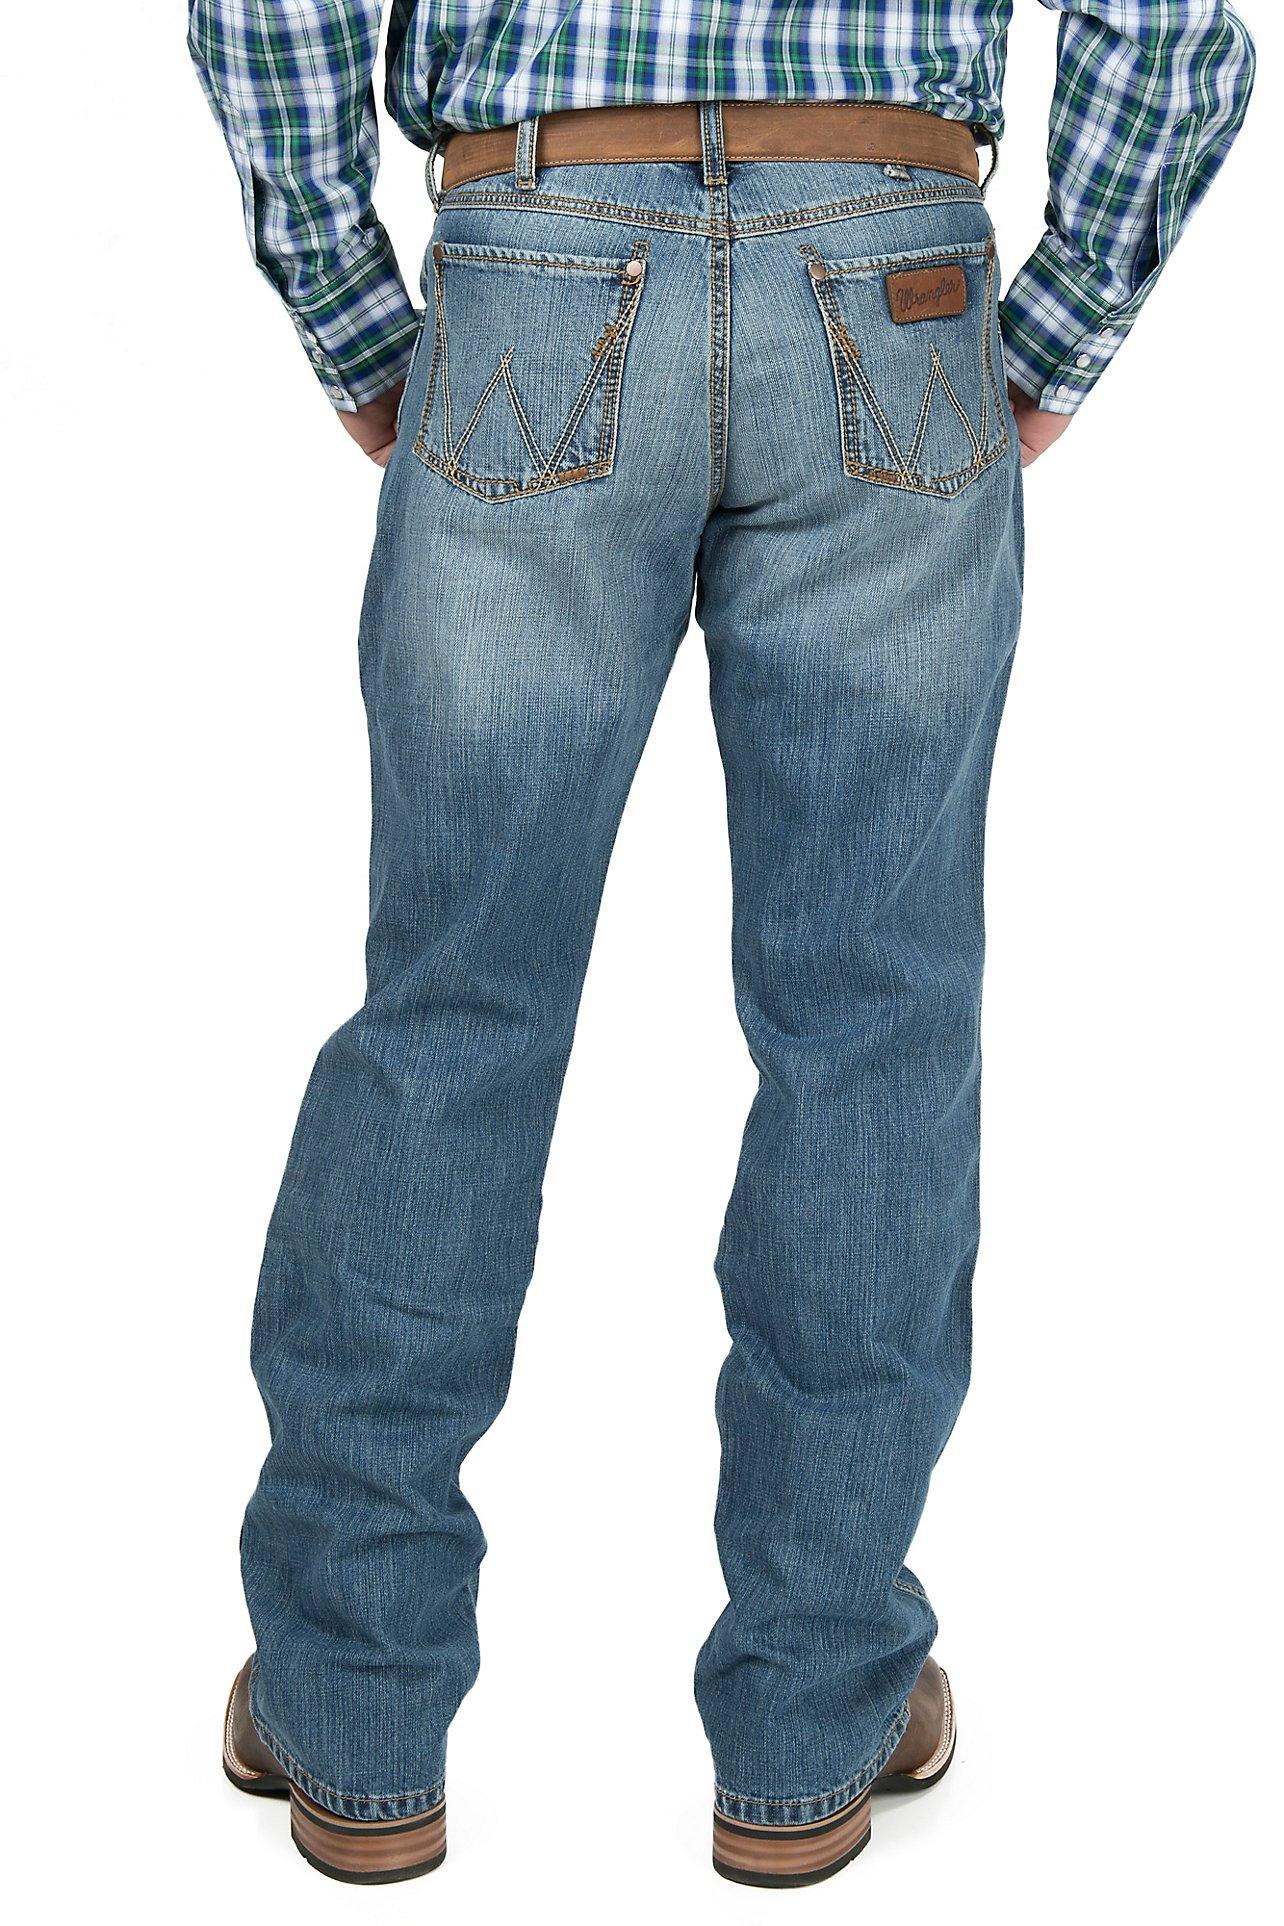 Shop Men's Wrangler Retro Jeans | Free Shipping $50  | at Cavender's